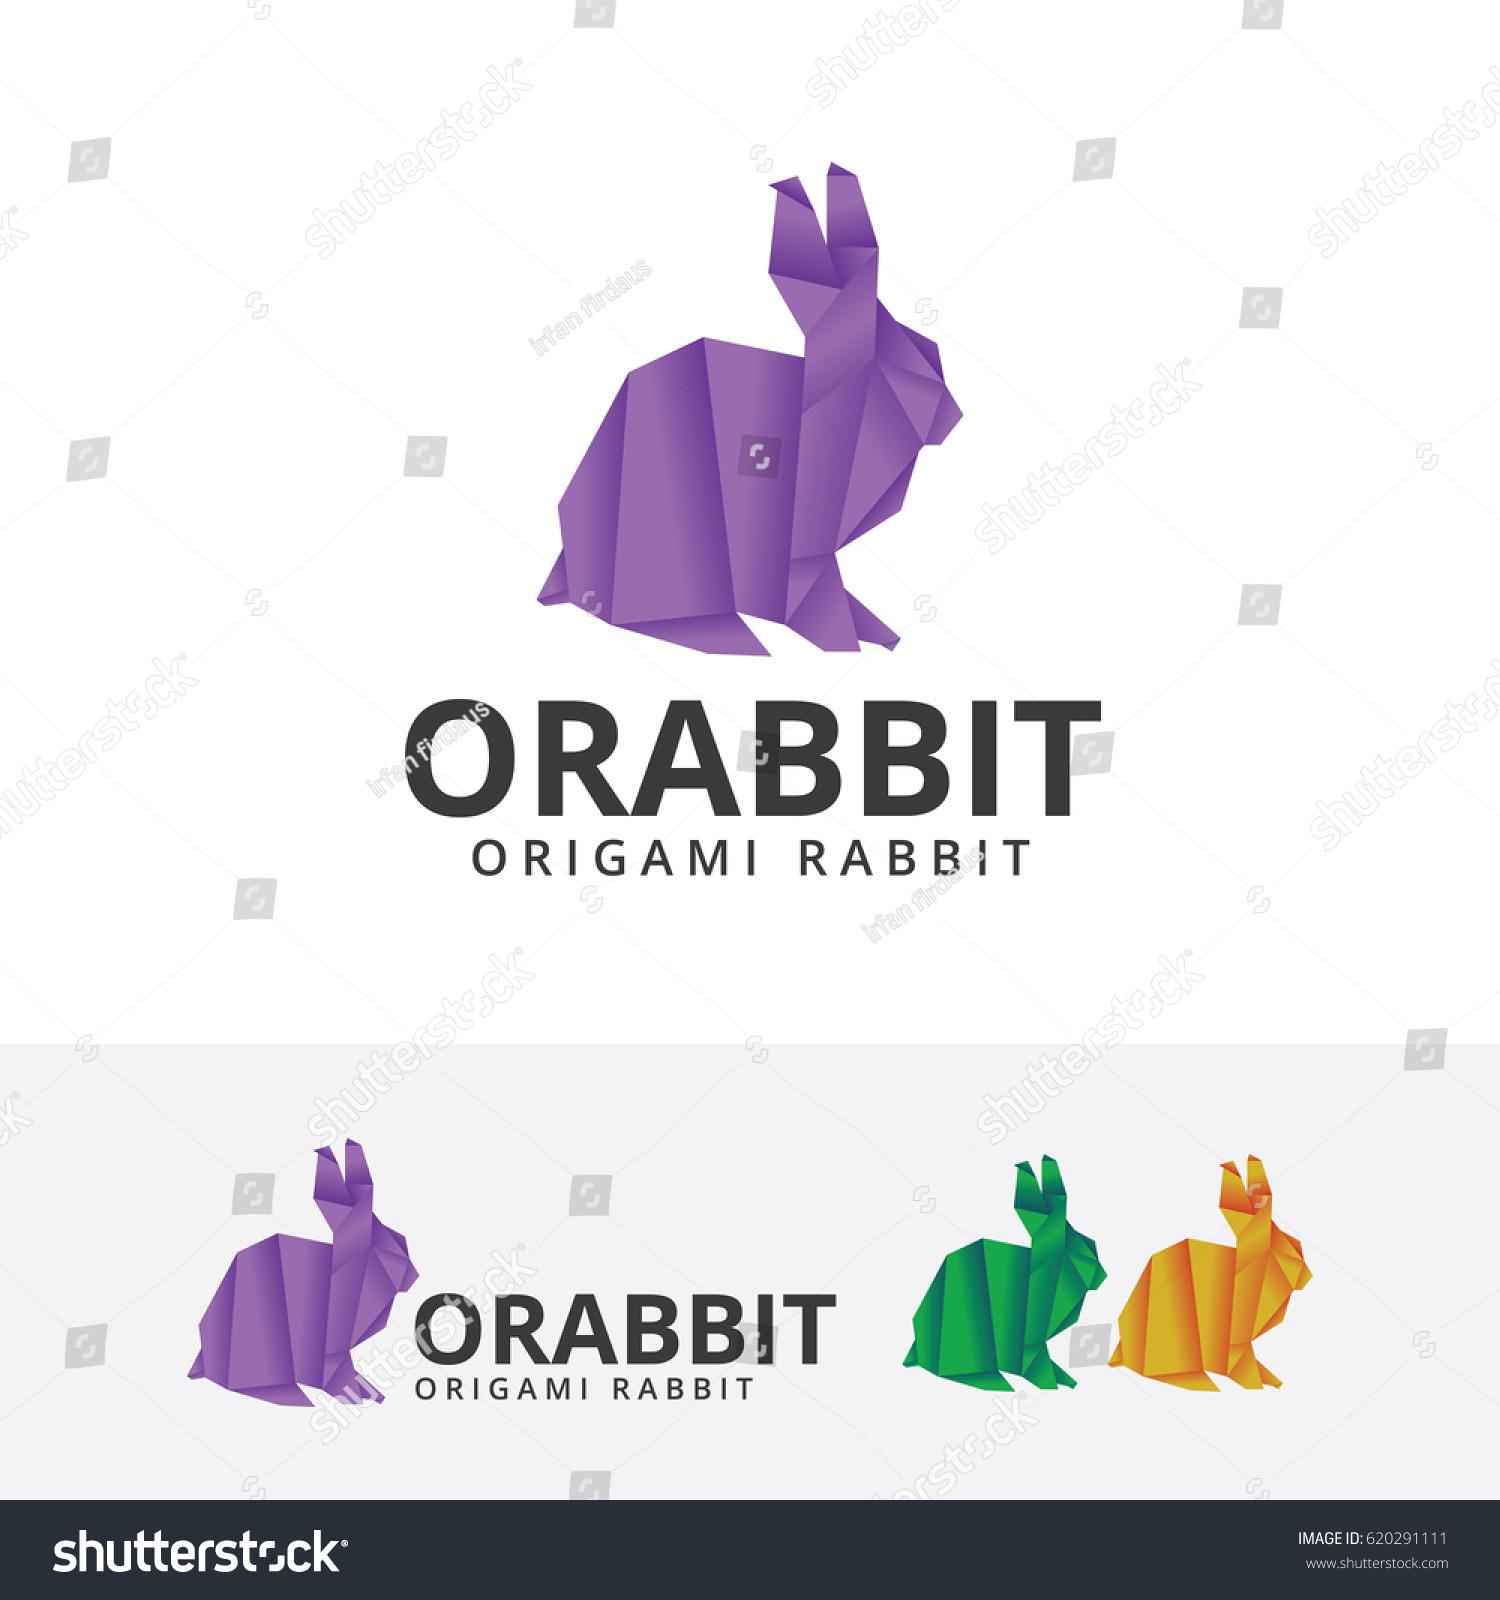 Origami Rabbit Vector Logo Template Stock Vector 620291111